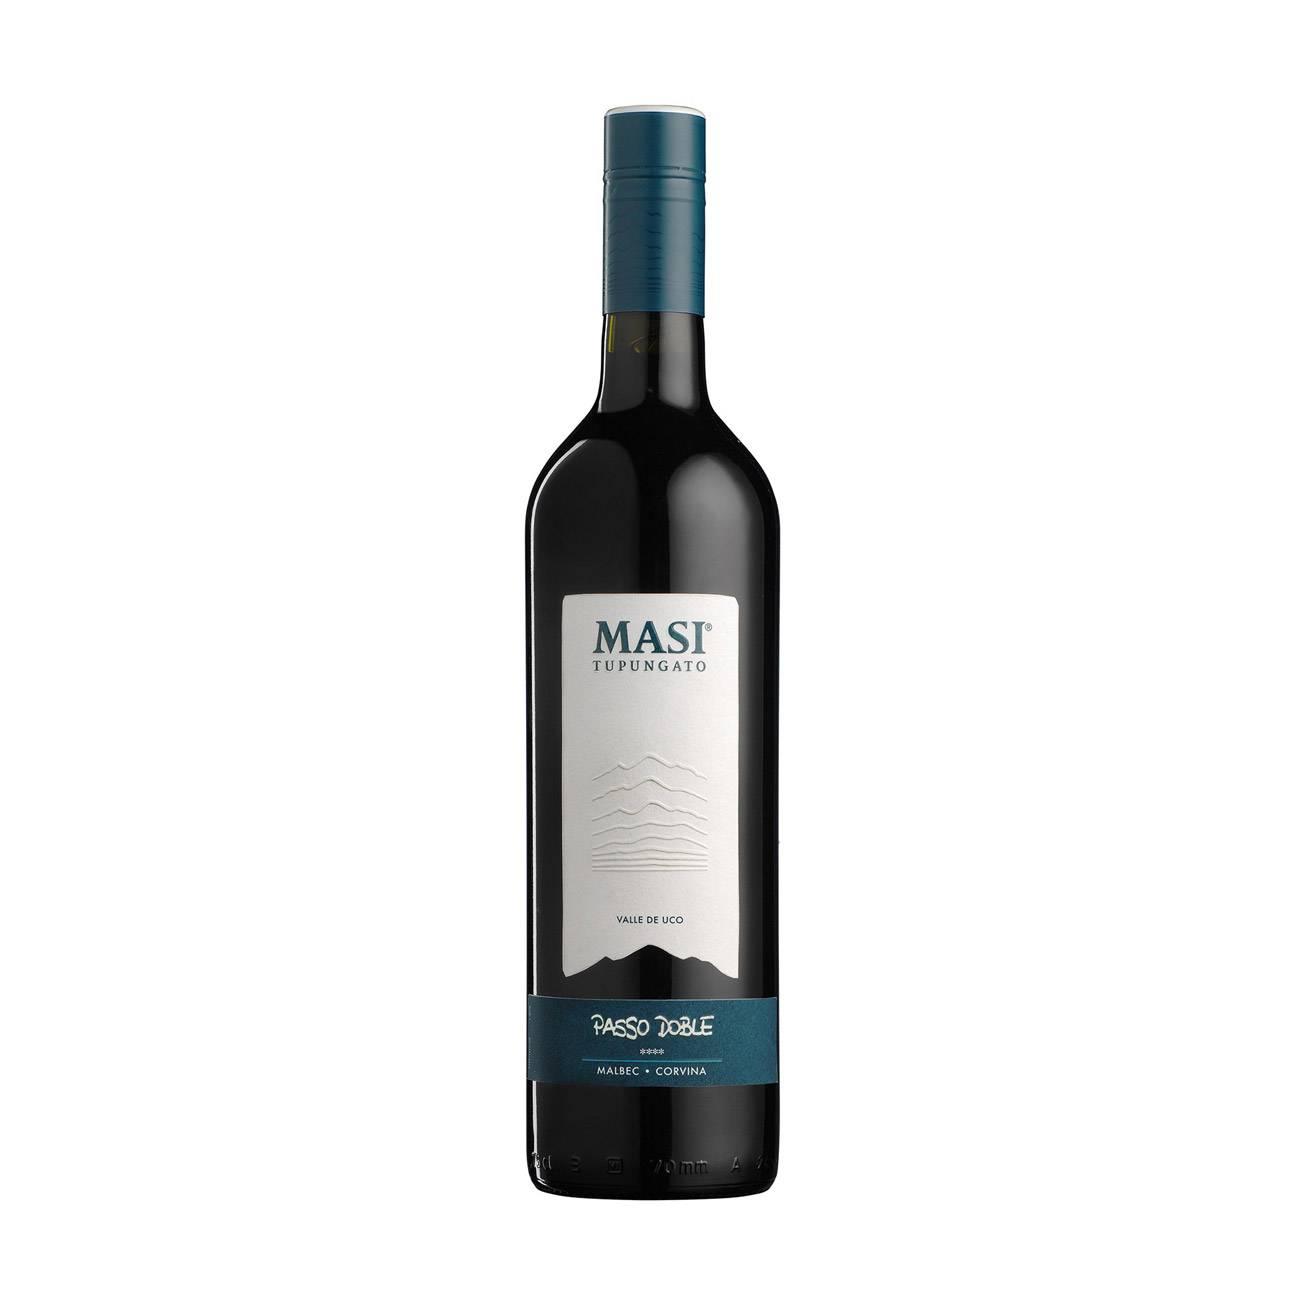 Vinuri, Passo Doble 750 Ml, MASI